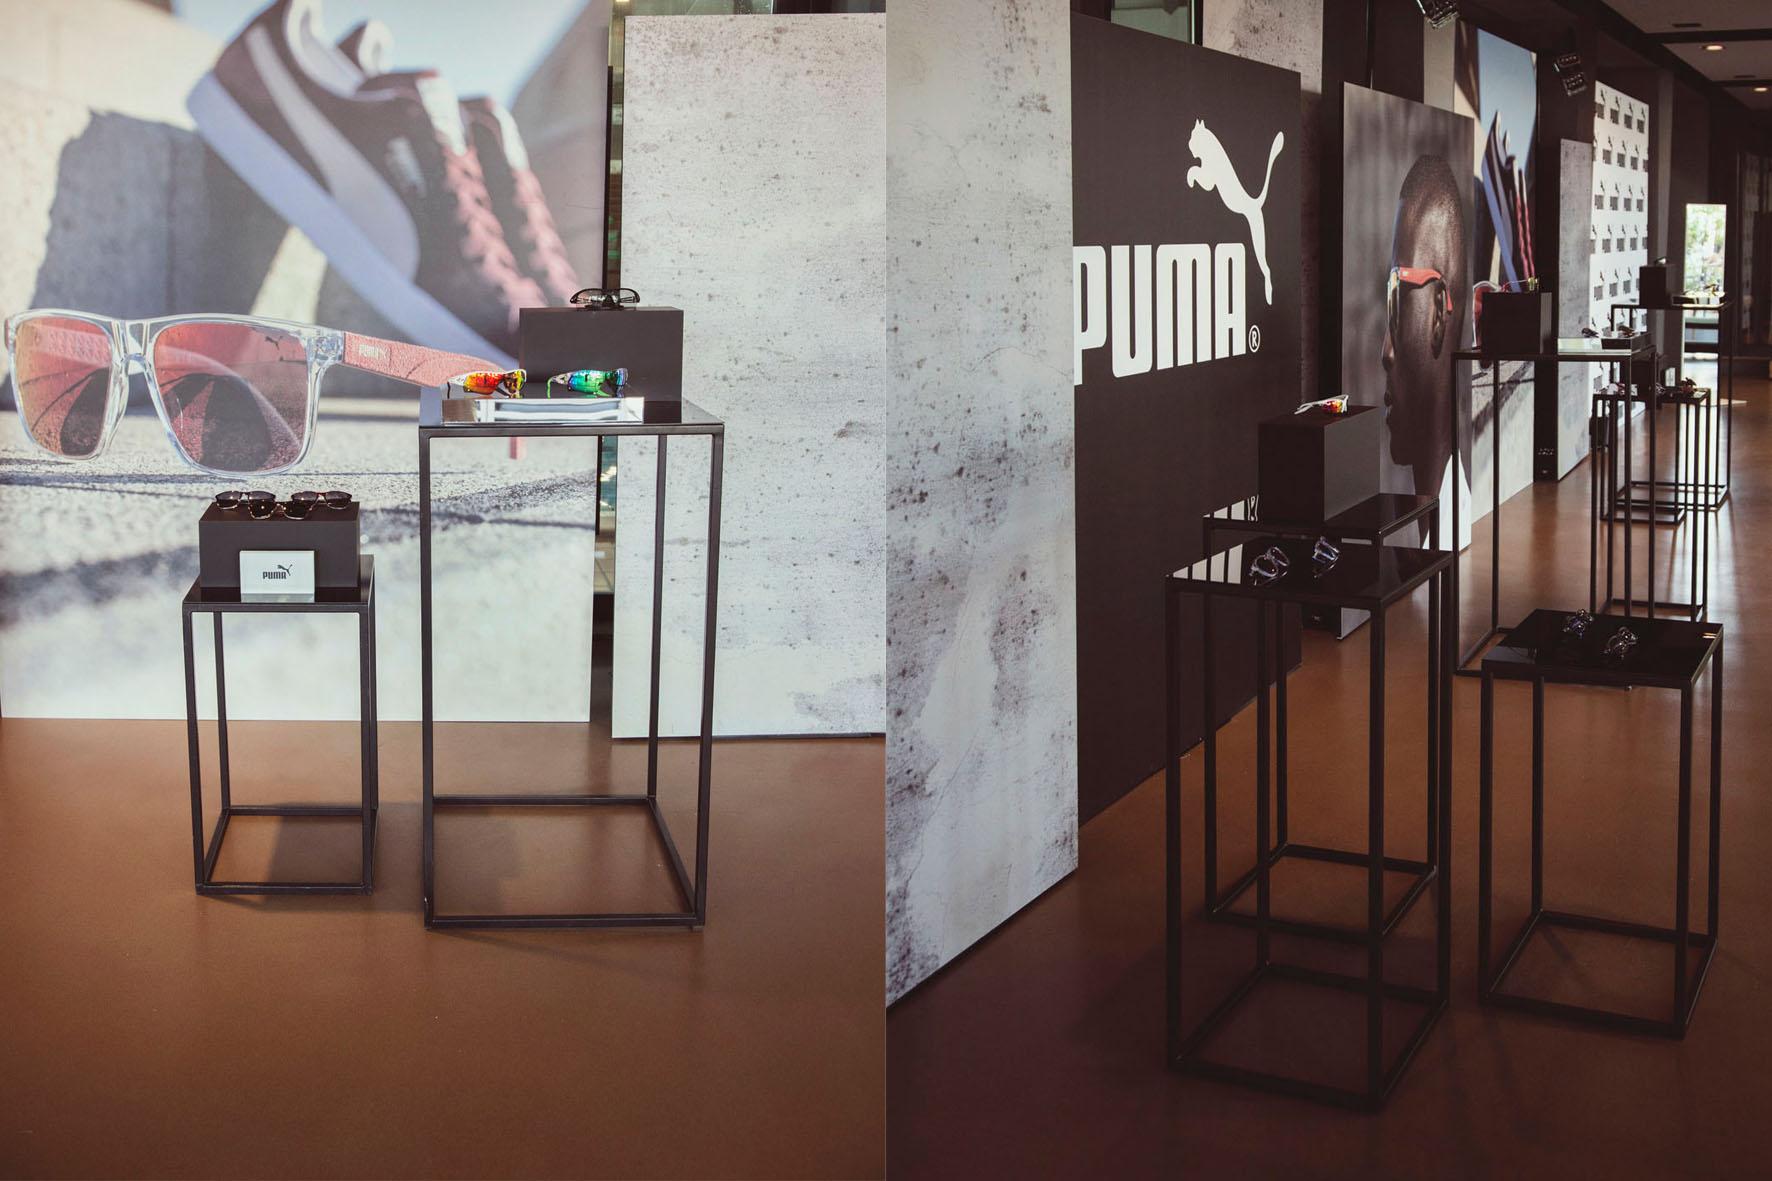 Puma EyeWear PressDay setup Attila&Co Canottieri Olona 05